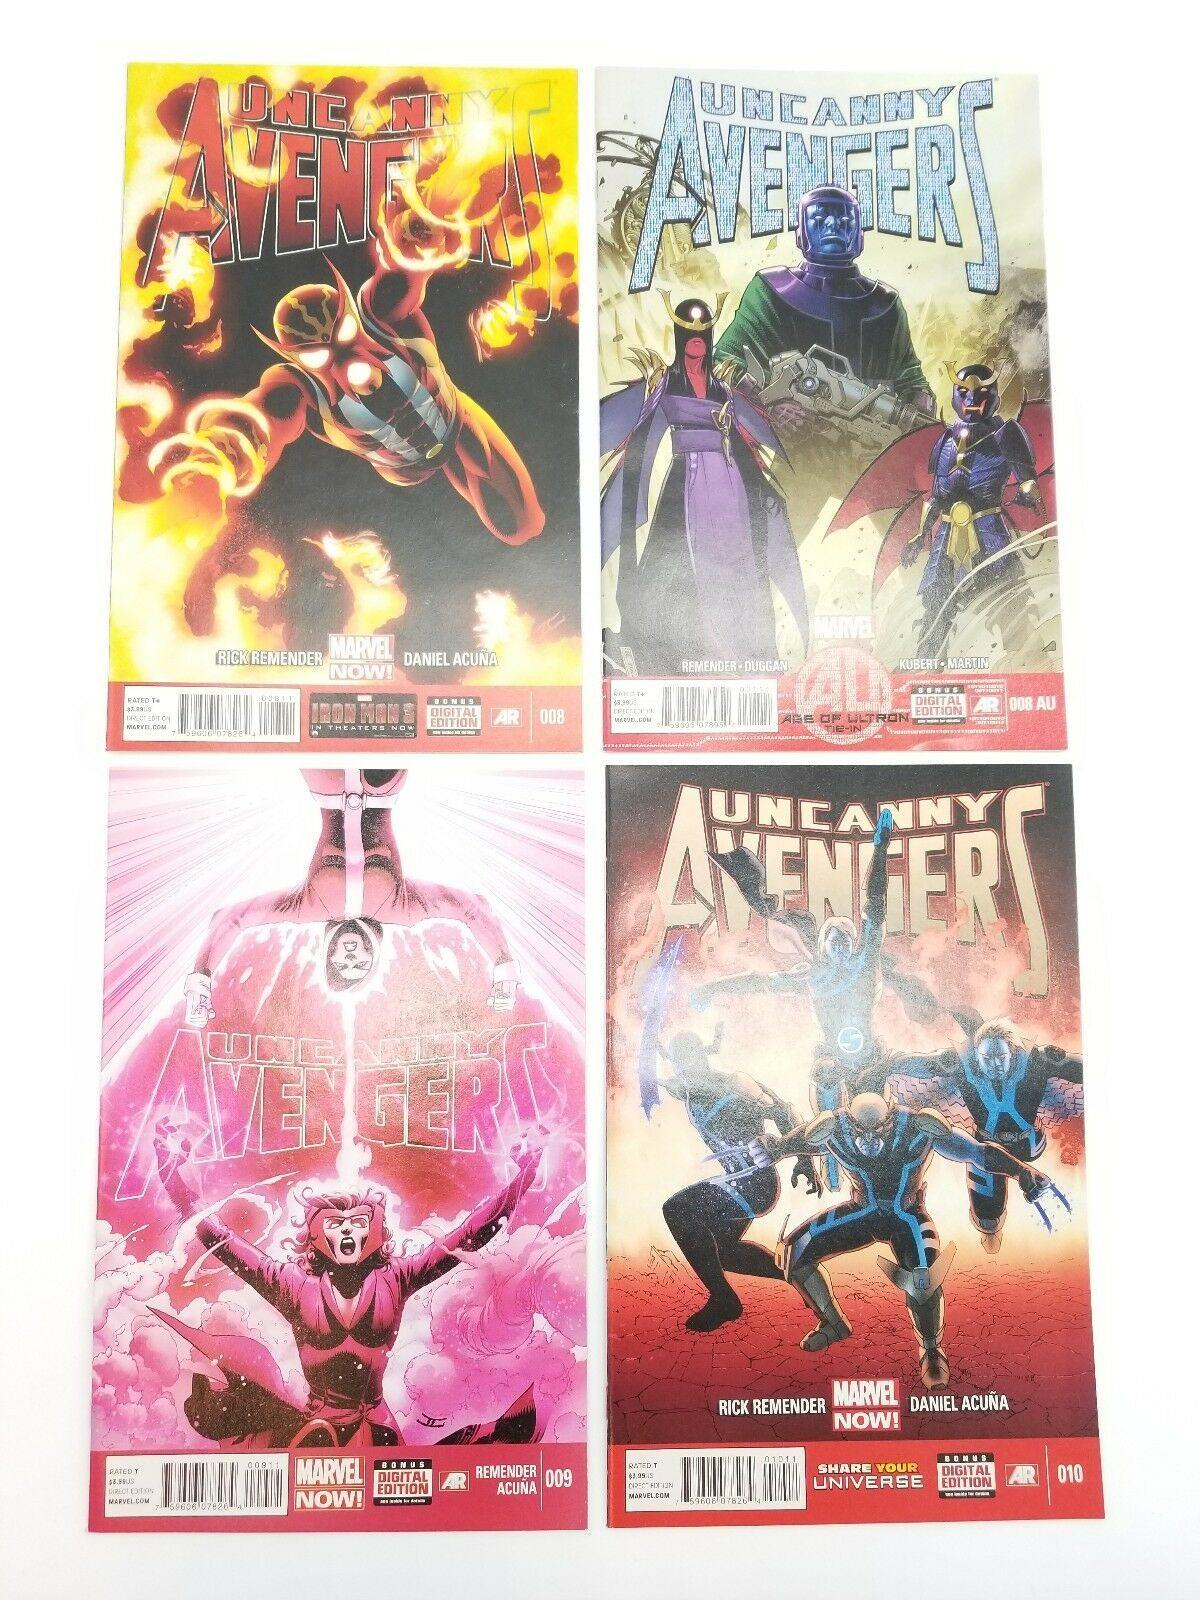 Uncanny Avengers 1-11 14-16 w/ Skottie Young Baby Variant Vol 1 2012 Comic Books image 6